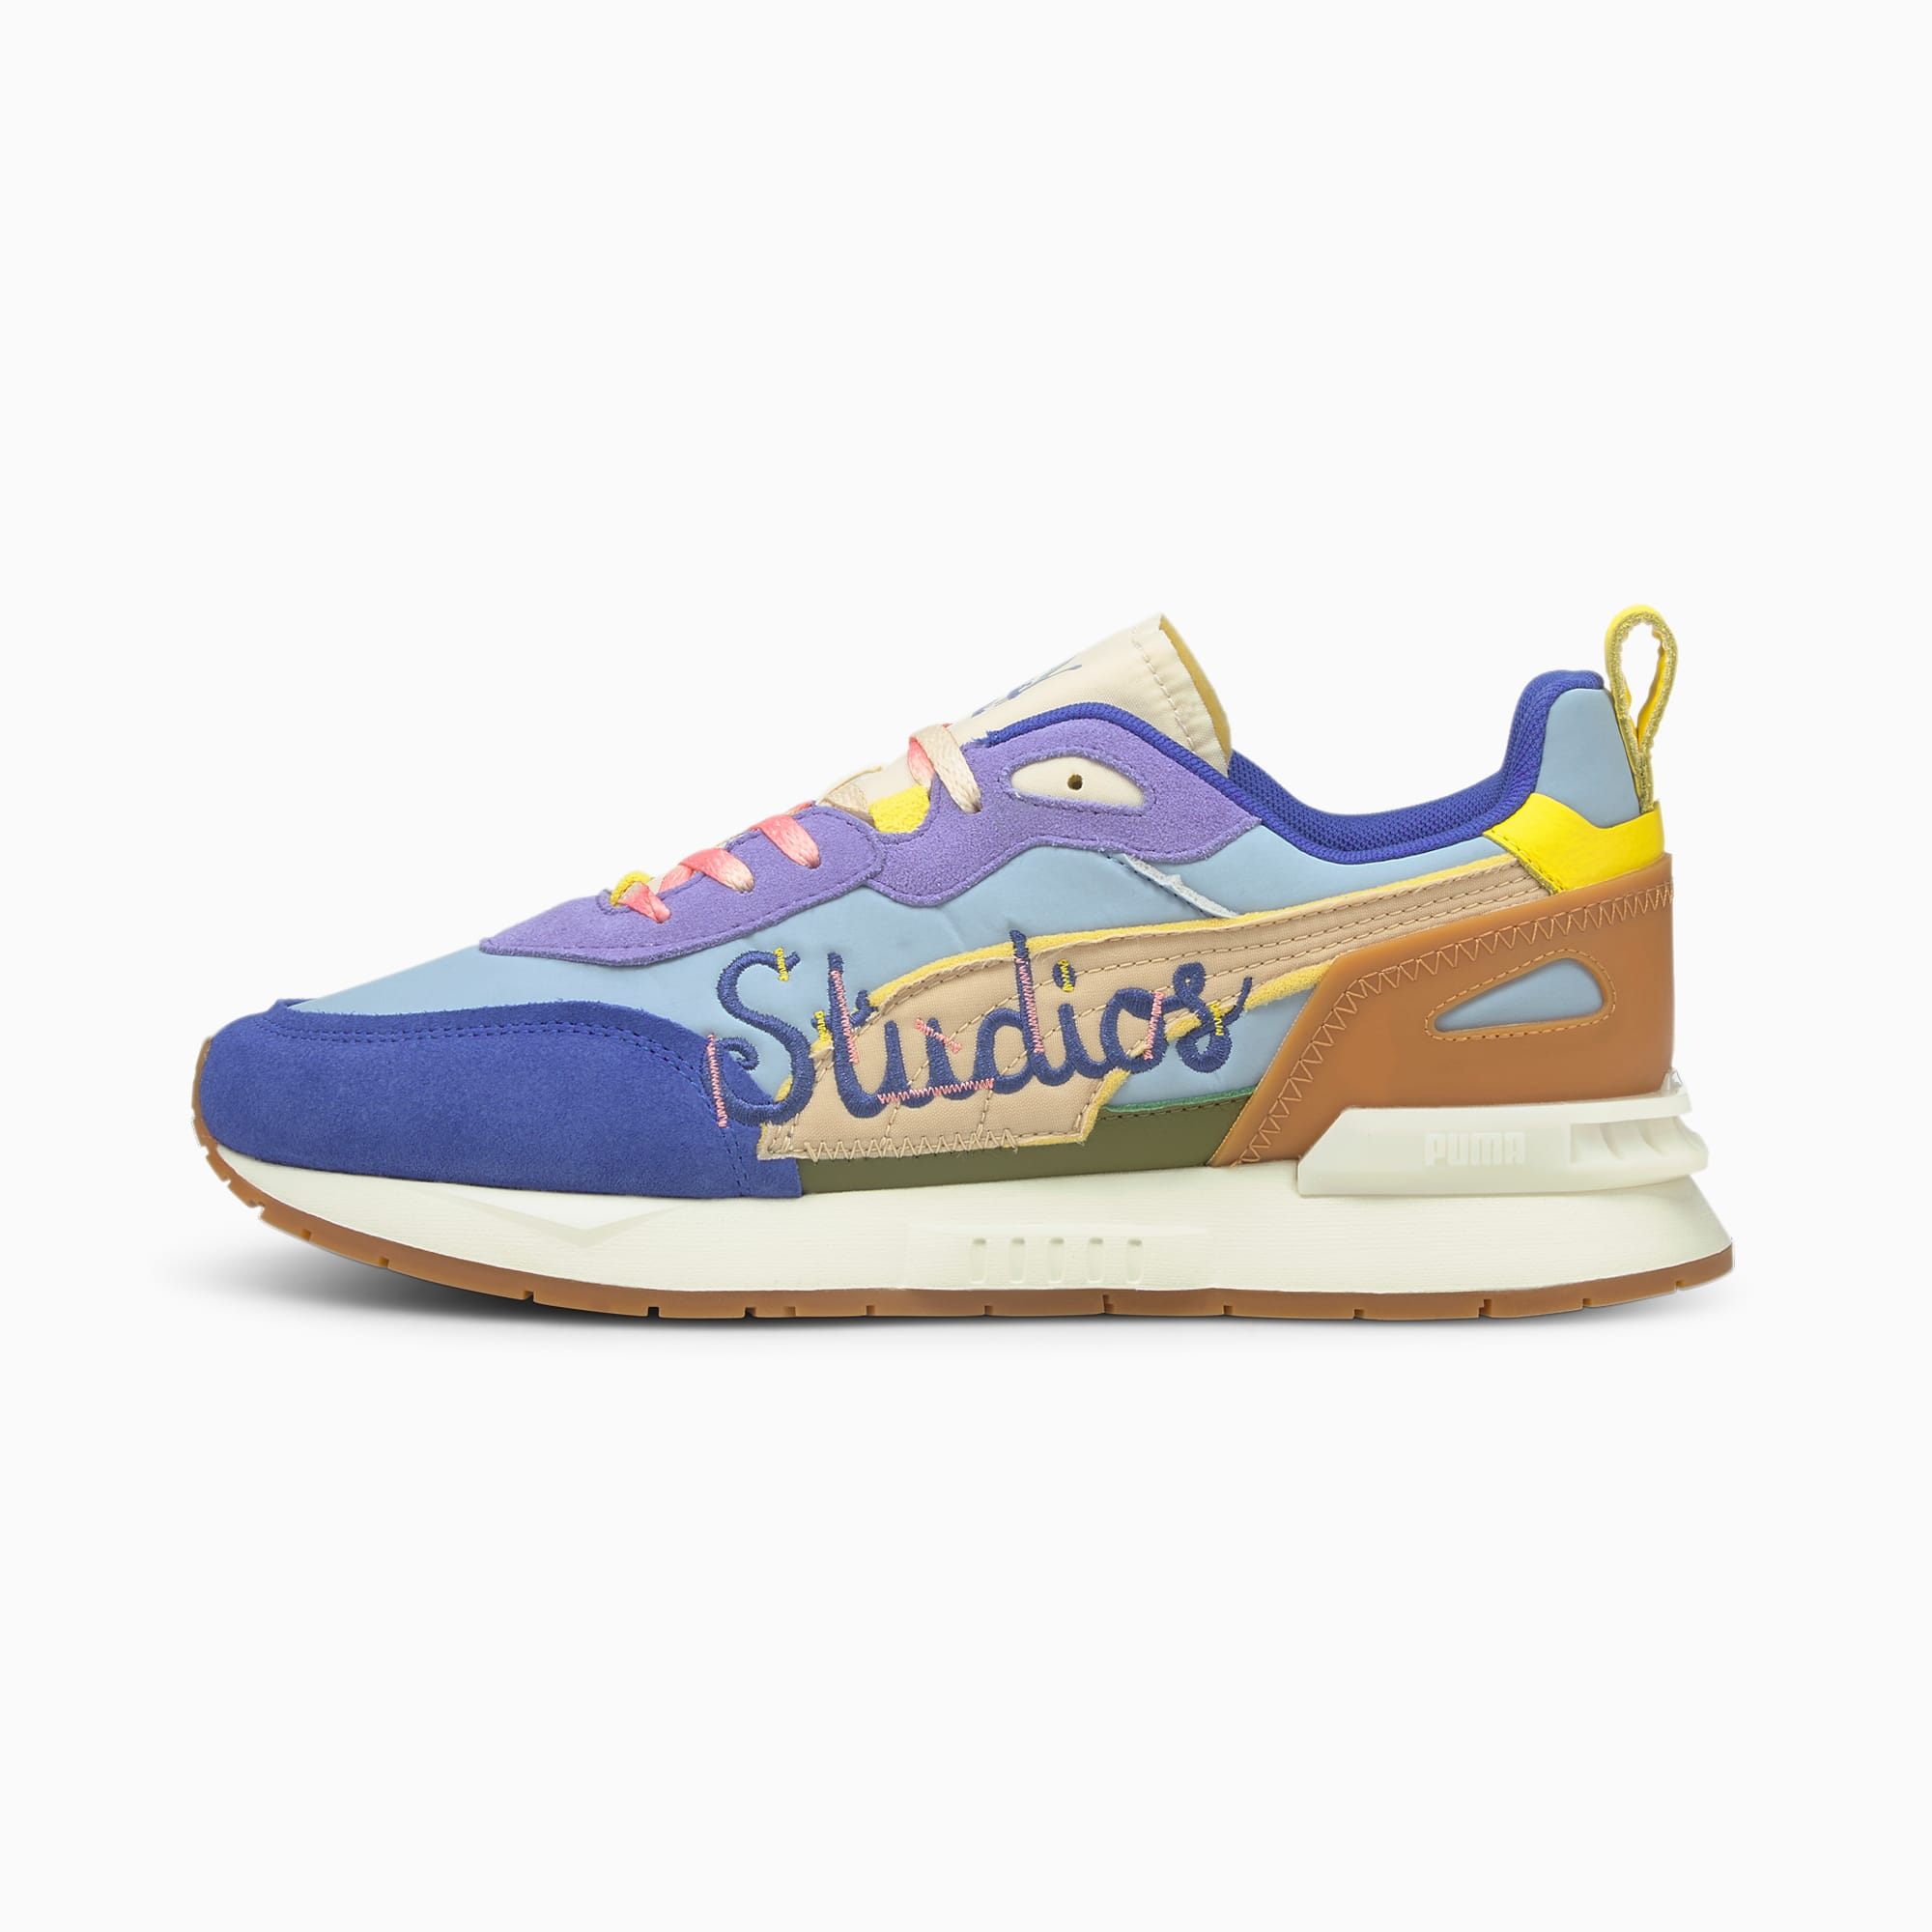 PUMA x KIDSUPER STUDIOS Mirage Mox Sneakers